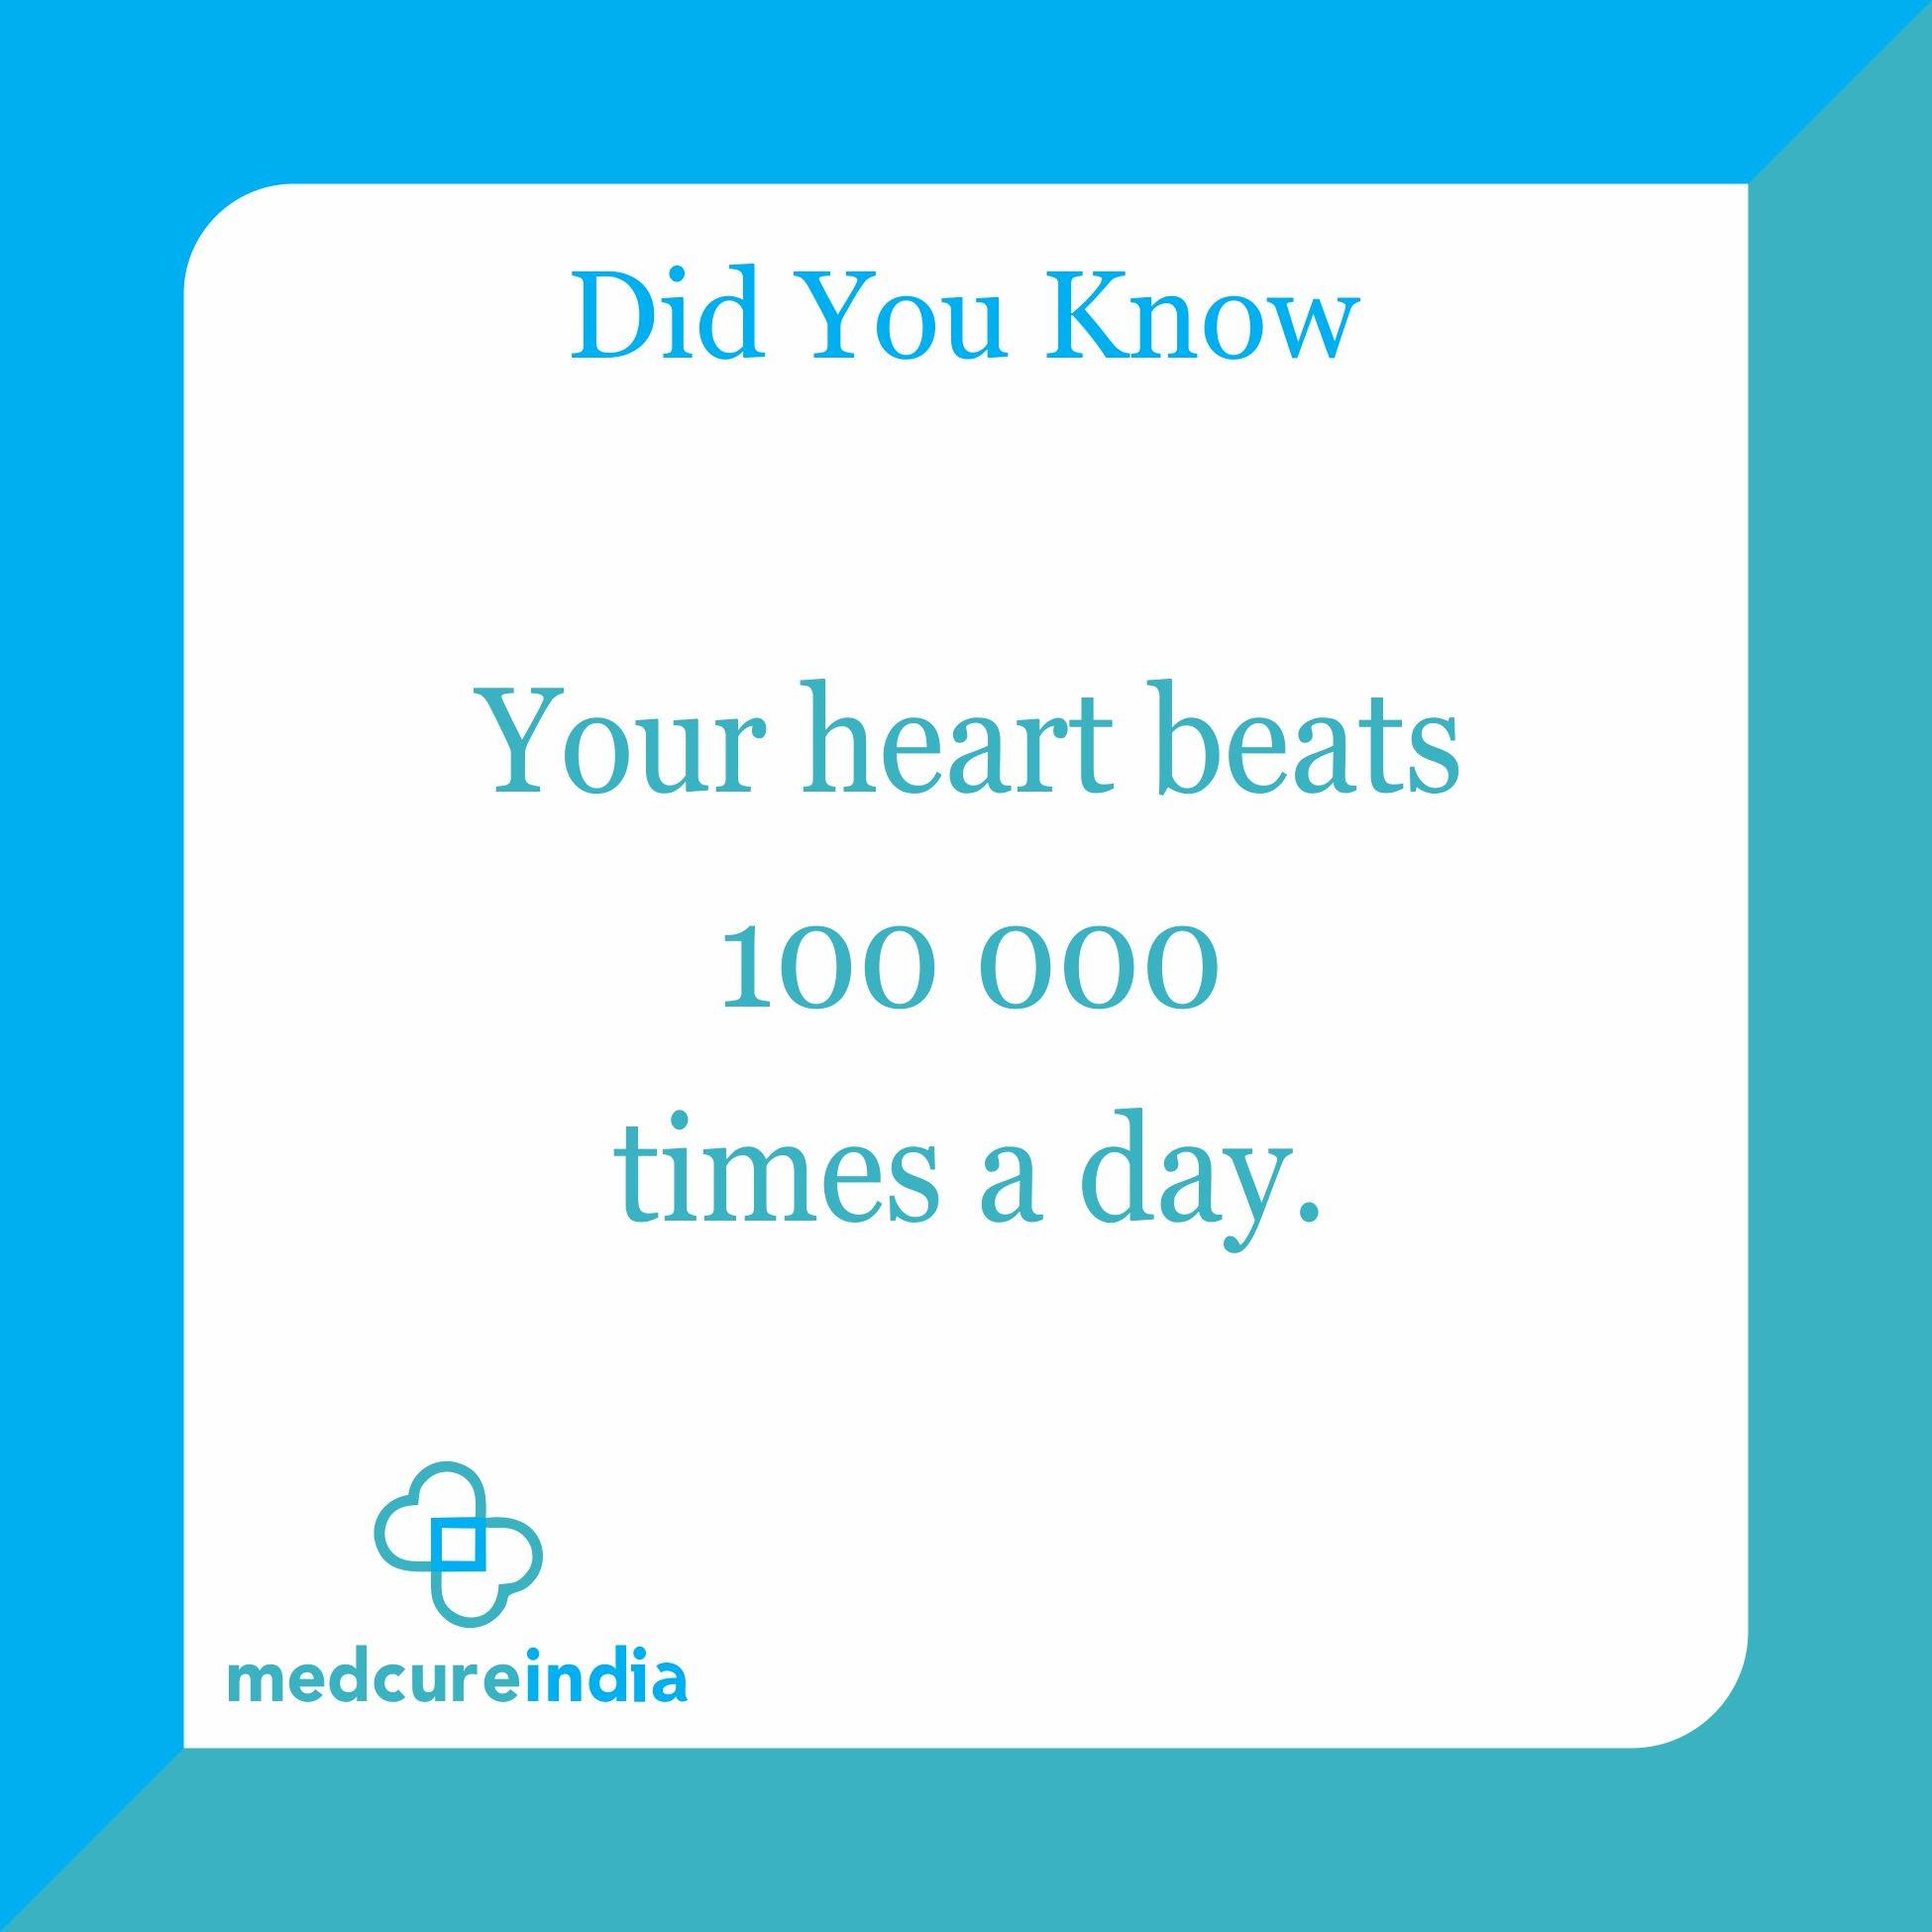 #didyouknow Your heart beats 100000 times a day.  #TuesdayThoughts #SixWordHorror #tanzaniya #jorden #maldiv #bangladesh #usa #uAE #srilanka #canada #ethopiya #londan #Uzbekistan  #Nigeria https://t.co/SzIX0hLfOs